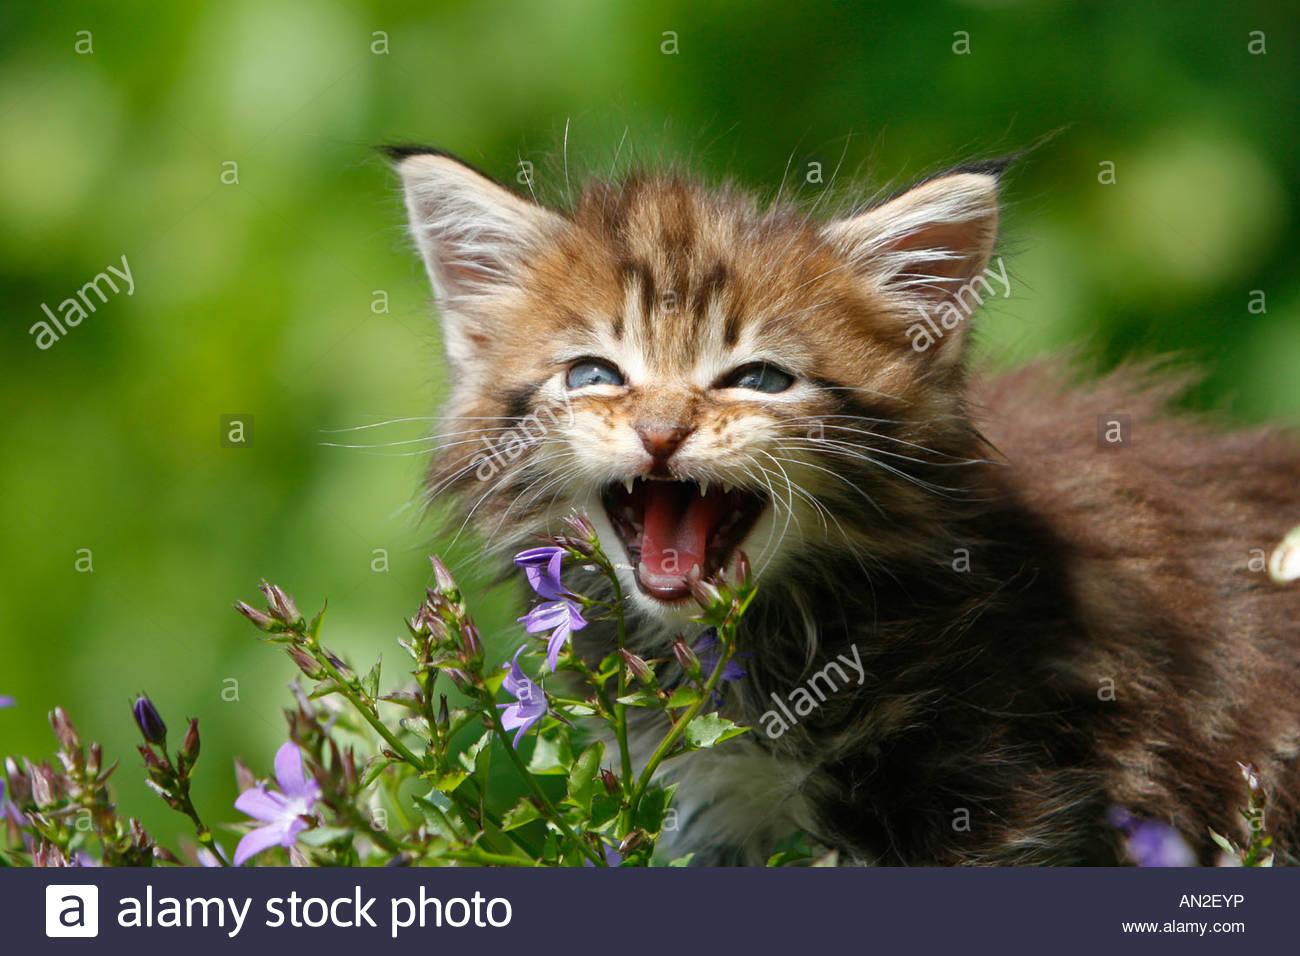 Cat Cute Funny Cup